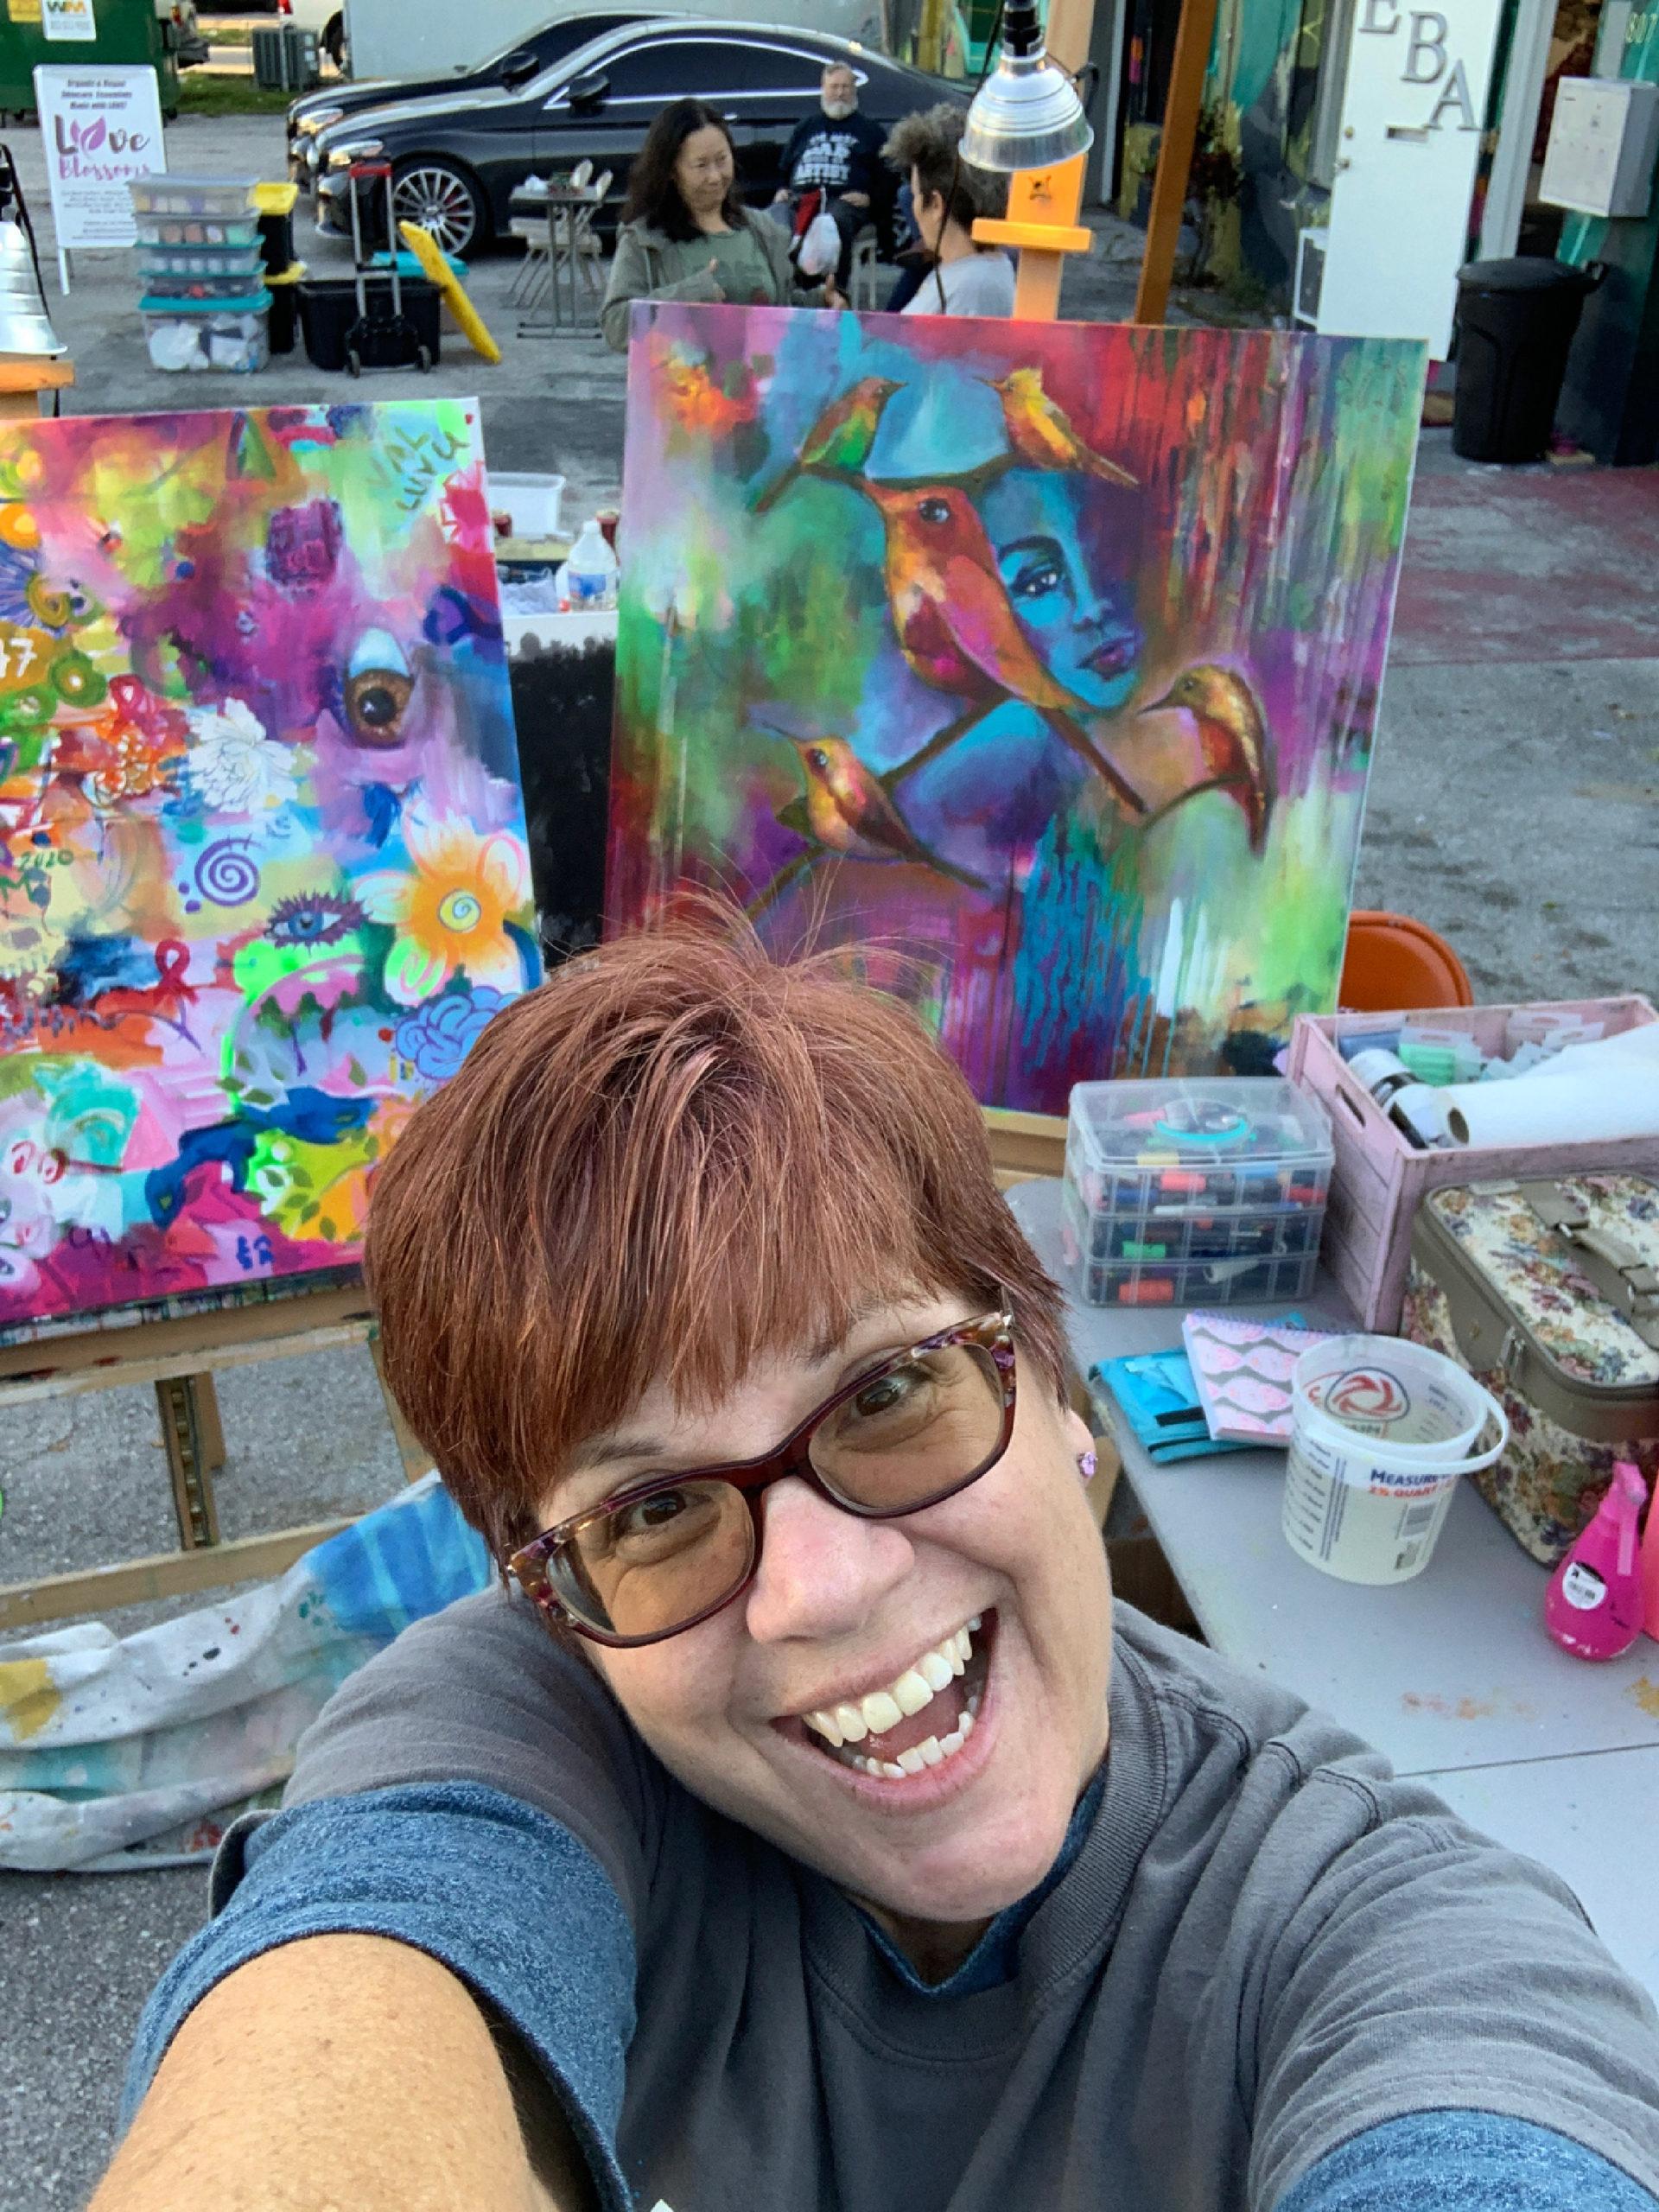 #146 Heather Neiman: South Florida Mixed Media Artist